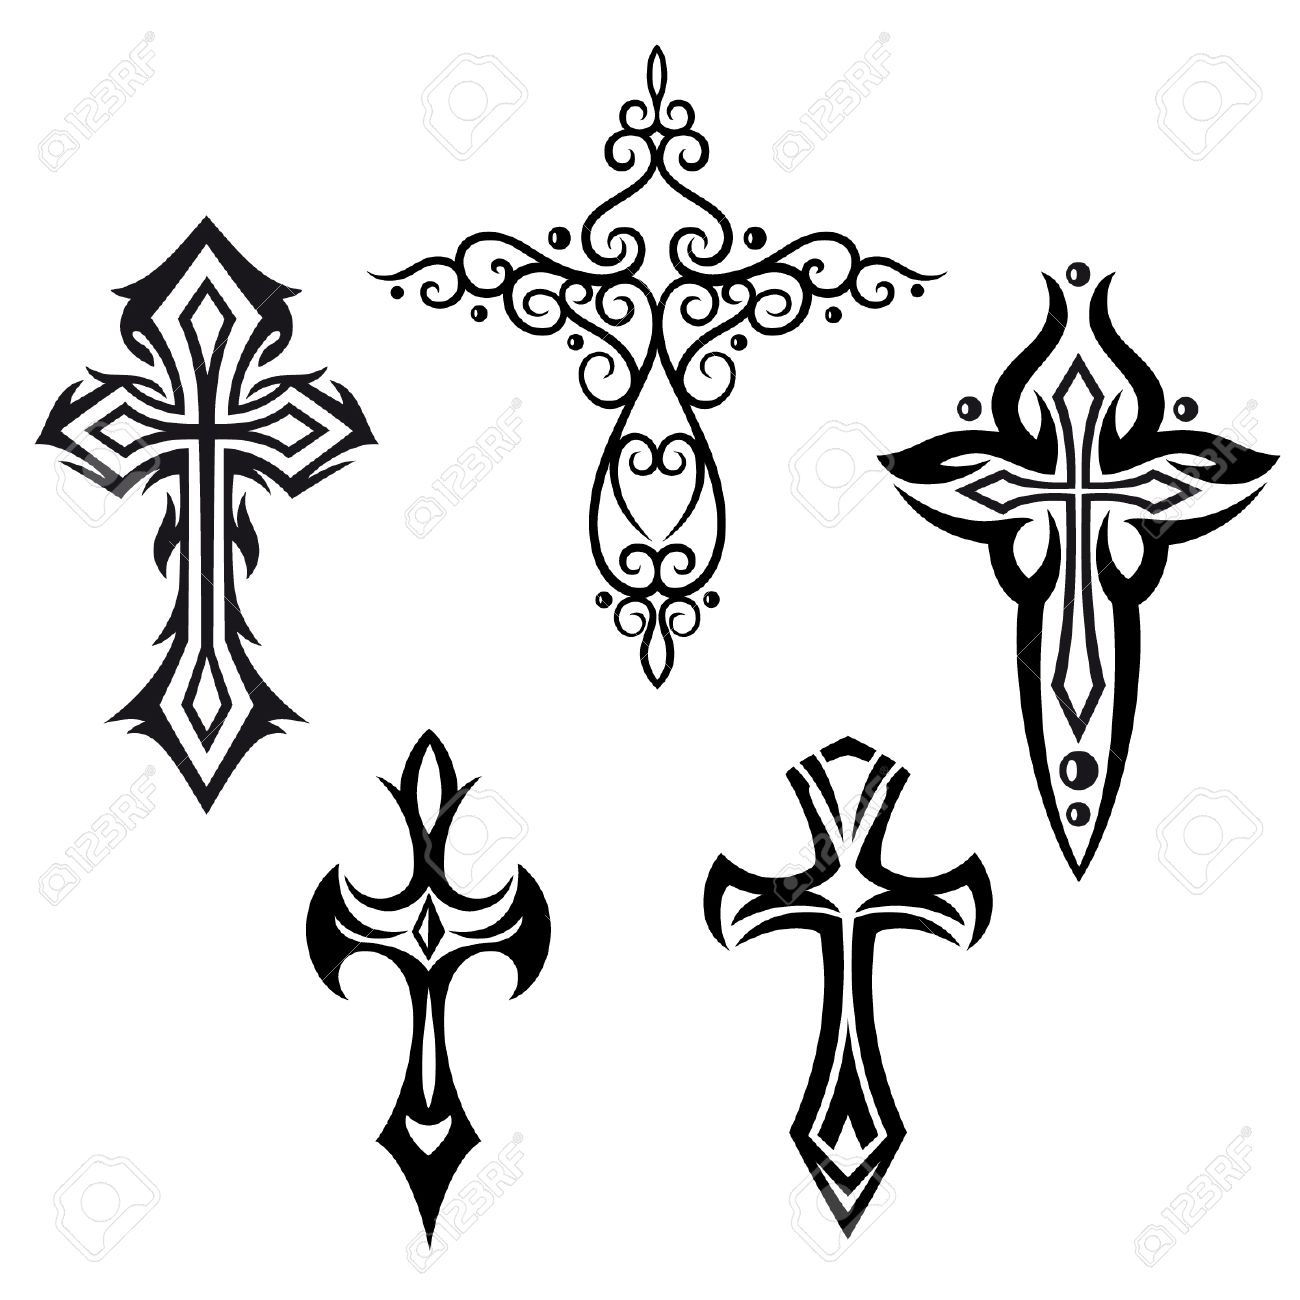 Vector mit Kreuzen Kruzifix religiösen design elements set Standard-Bild - 24600436